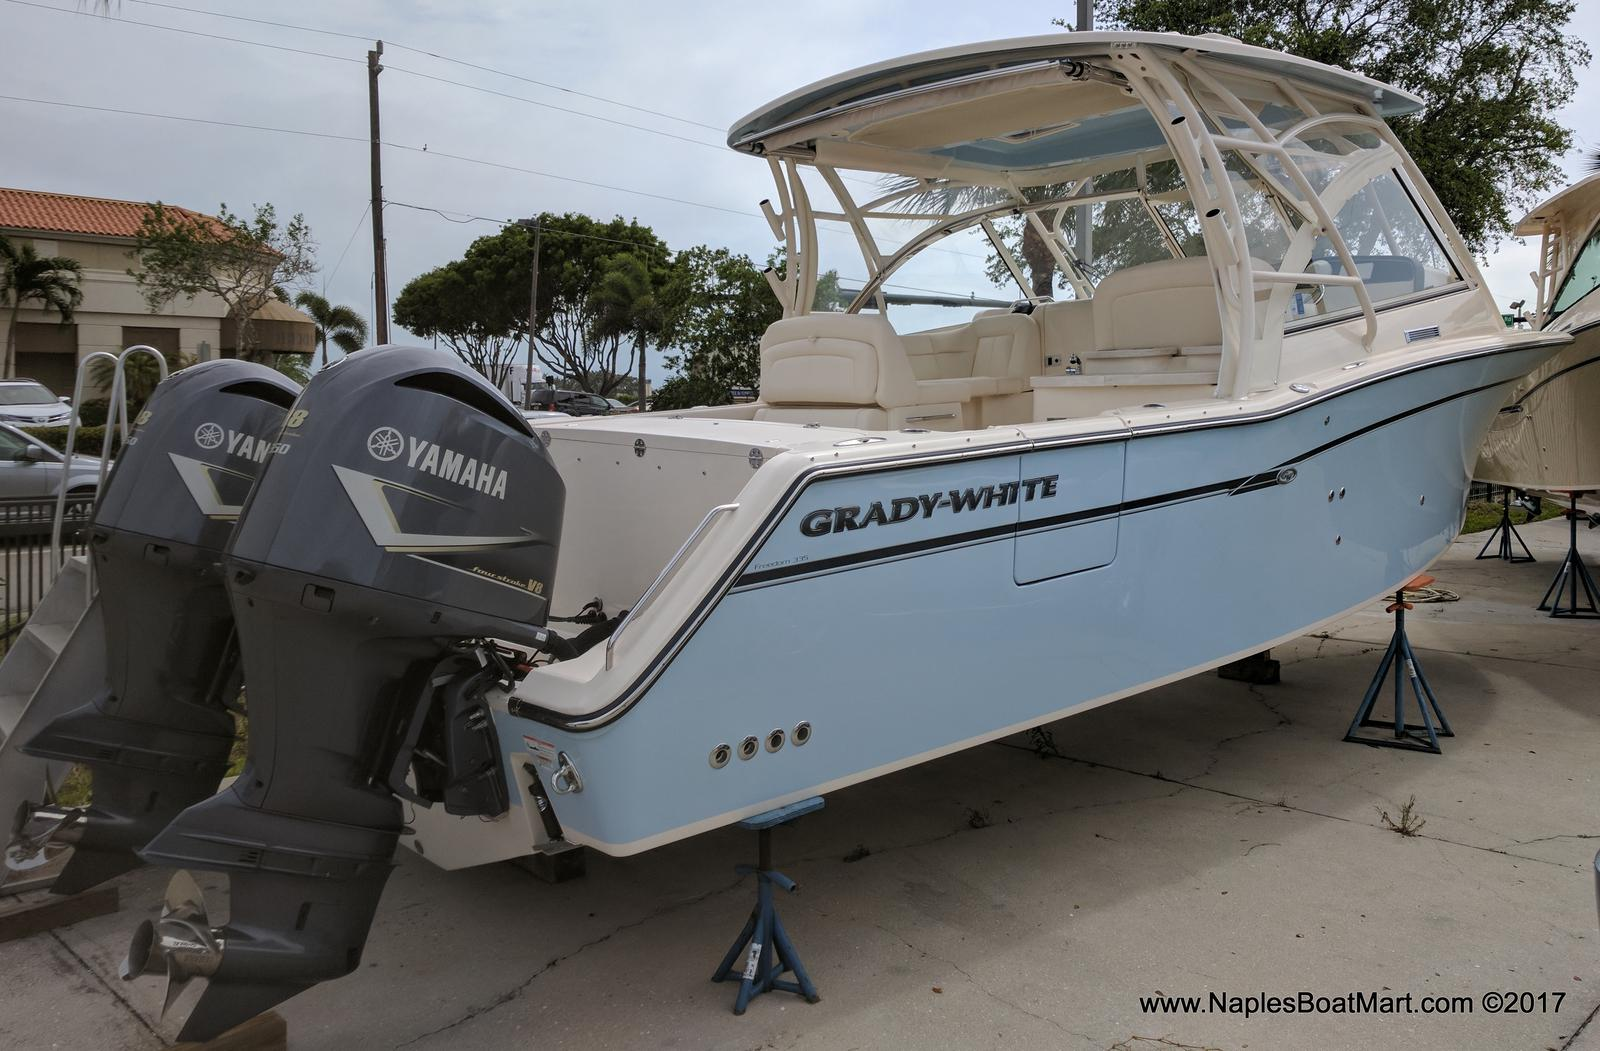 2019 Grady-White Freedom 335 for sale in Naples, FL  Naples